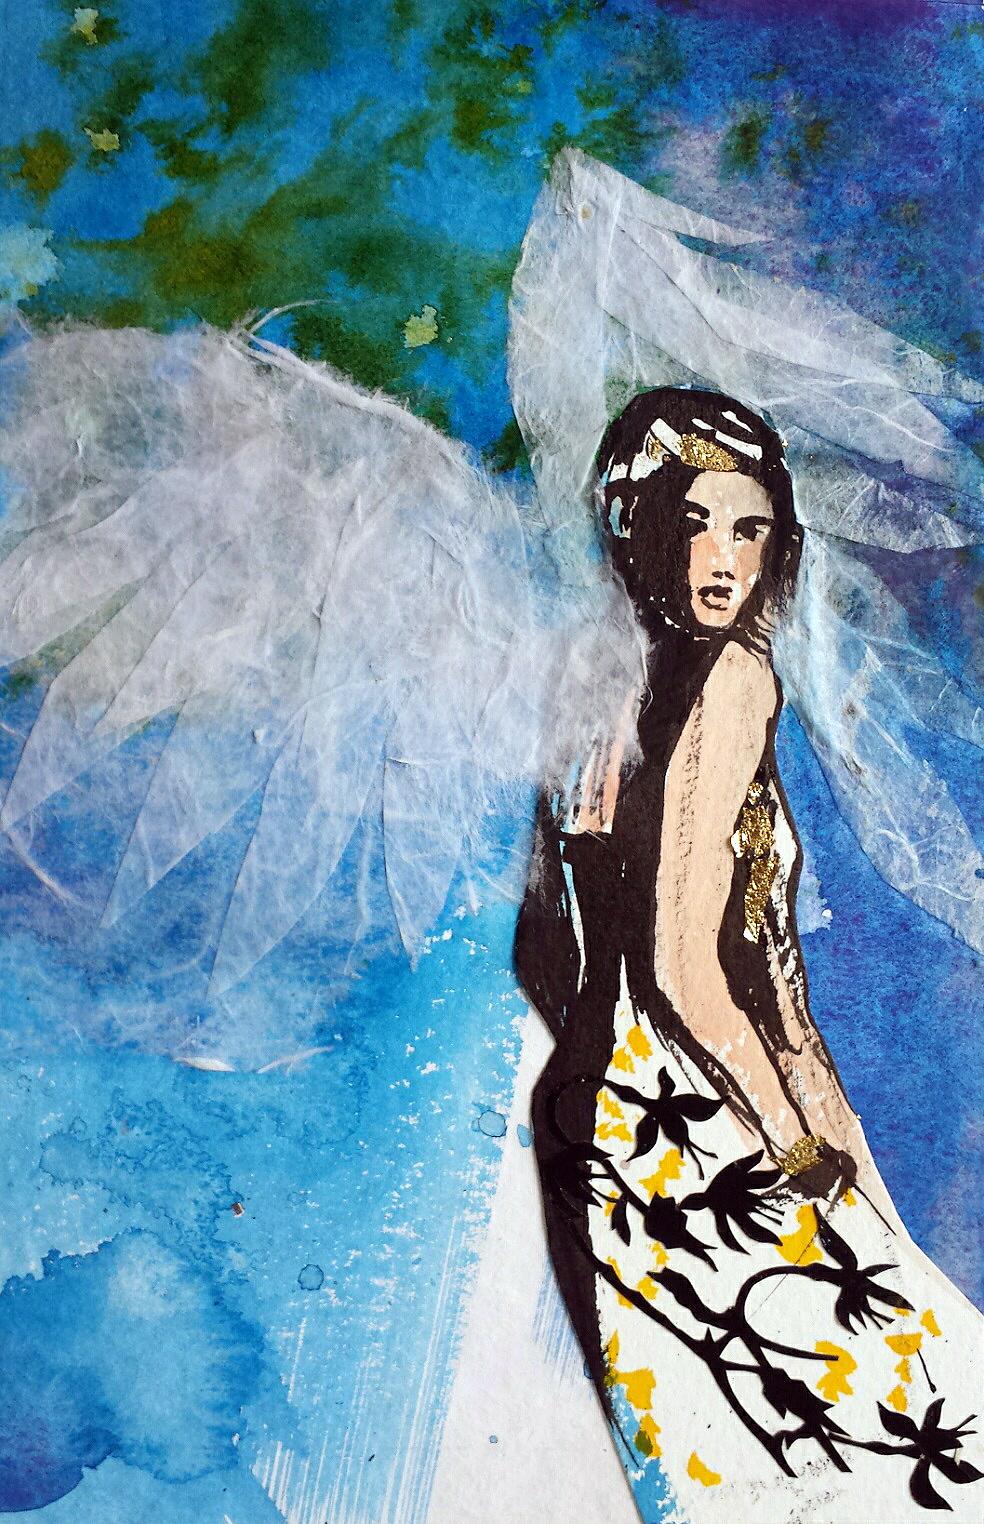 Engel in Blau, Aquarell und Tusche